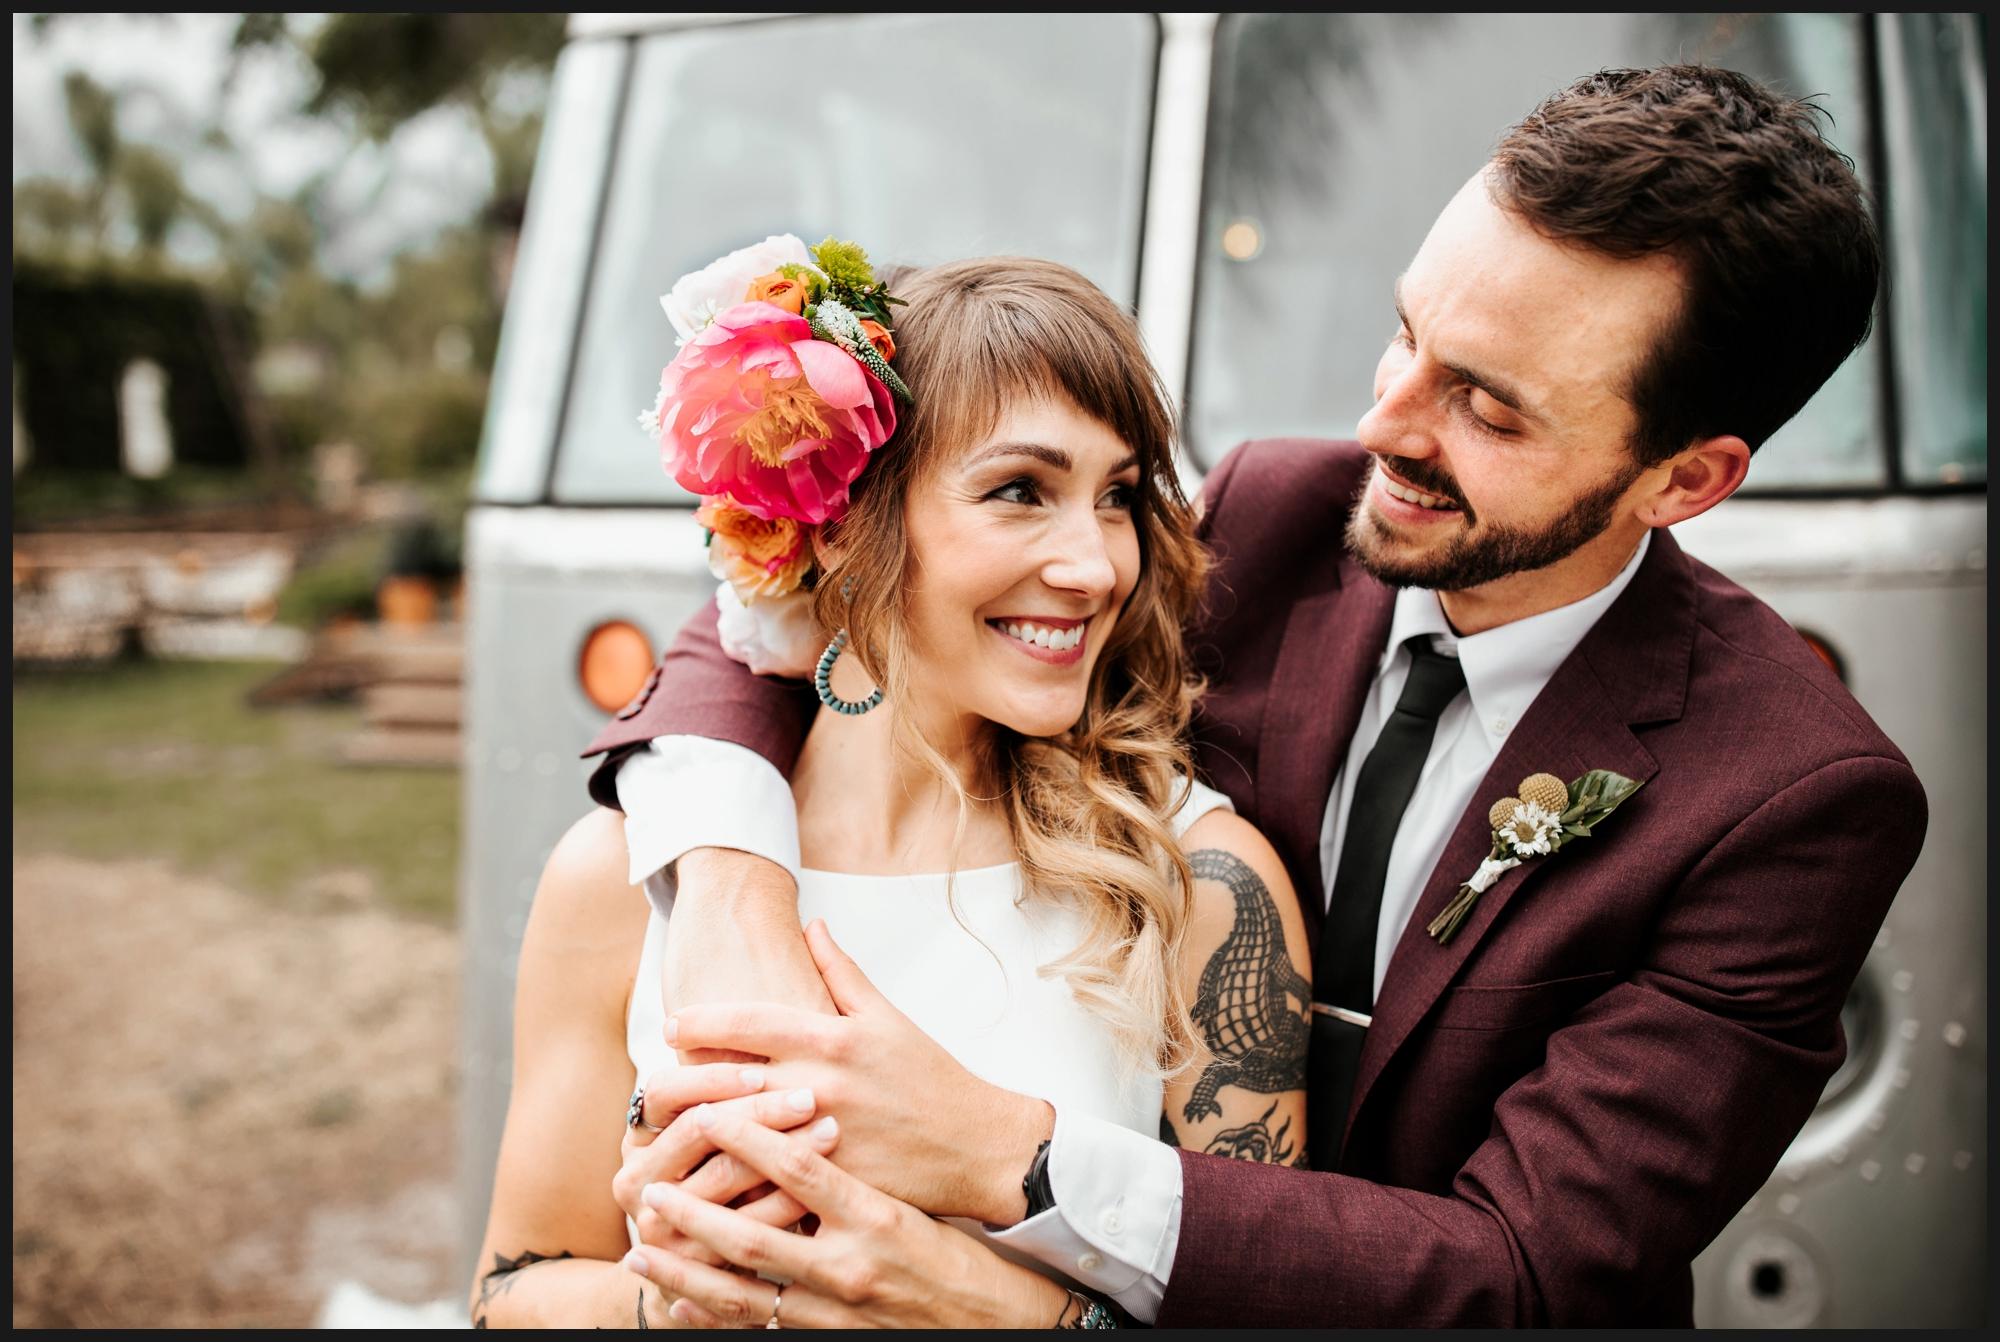 Orlando-Wedding-Photographer-destination-wedding-photographer-florida-wedding-photographer-bohemian-wedding-photographer_1995.jpg